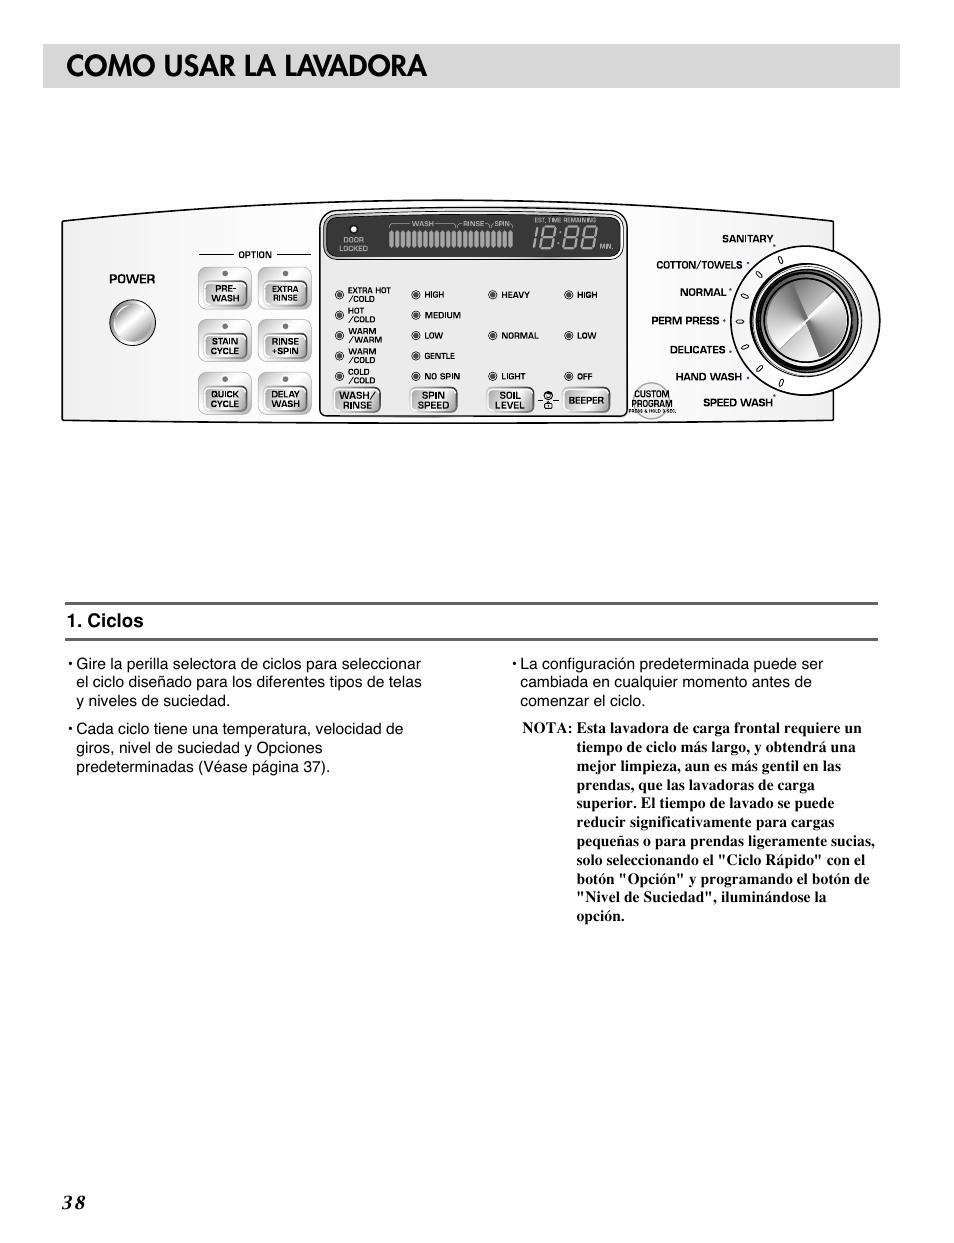 como usar la lavadora lg wm0532hw user manual page 38 48 rh manualsdir com LG WM0532HW Le Error Code LG WM0532HW Le Error Code